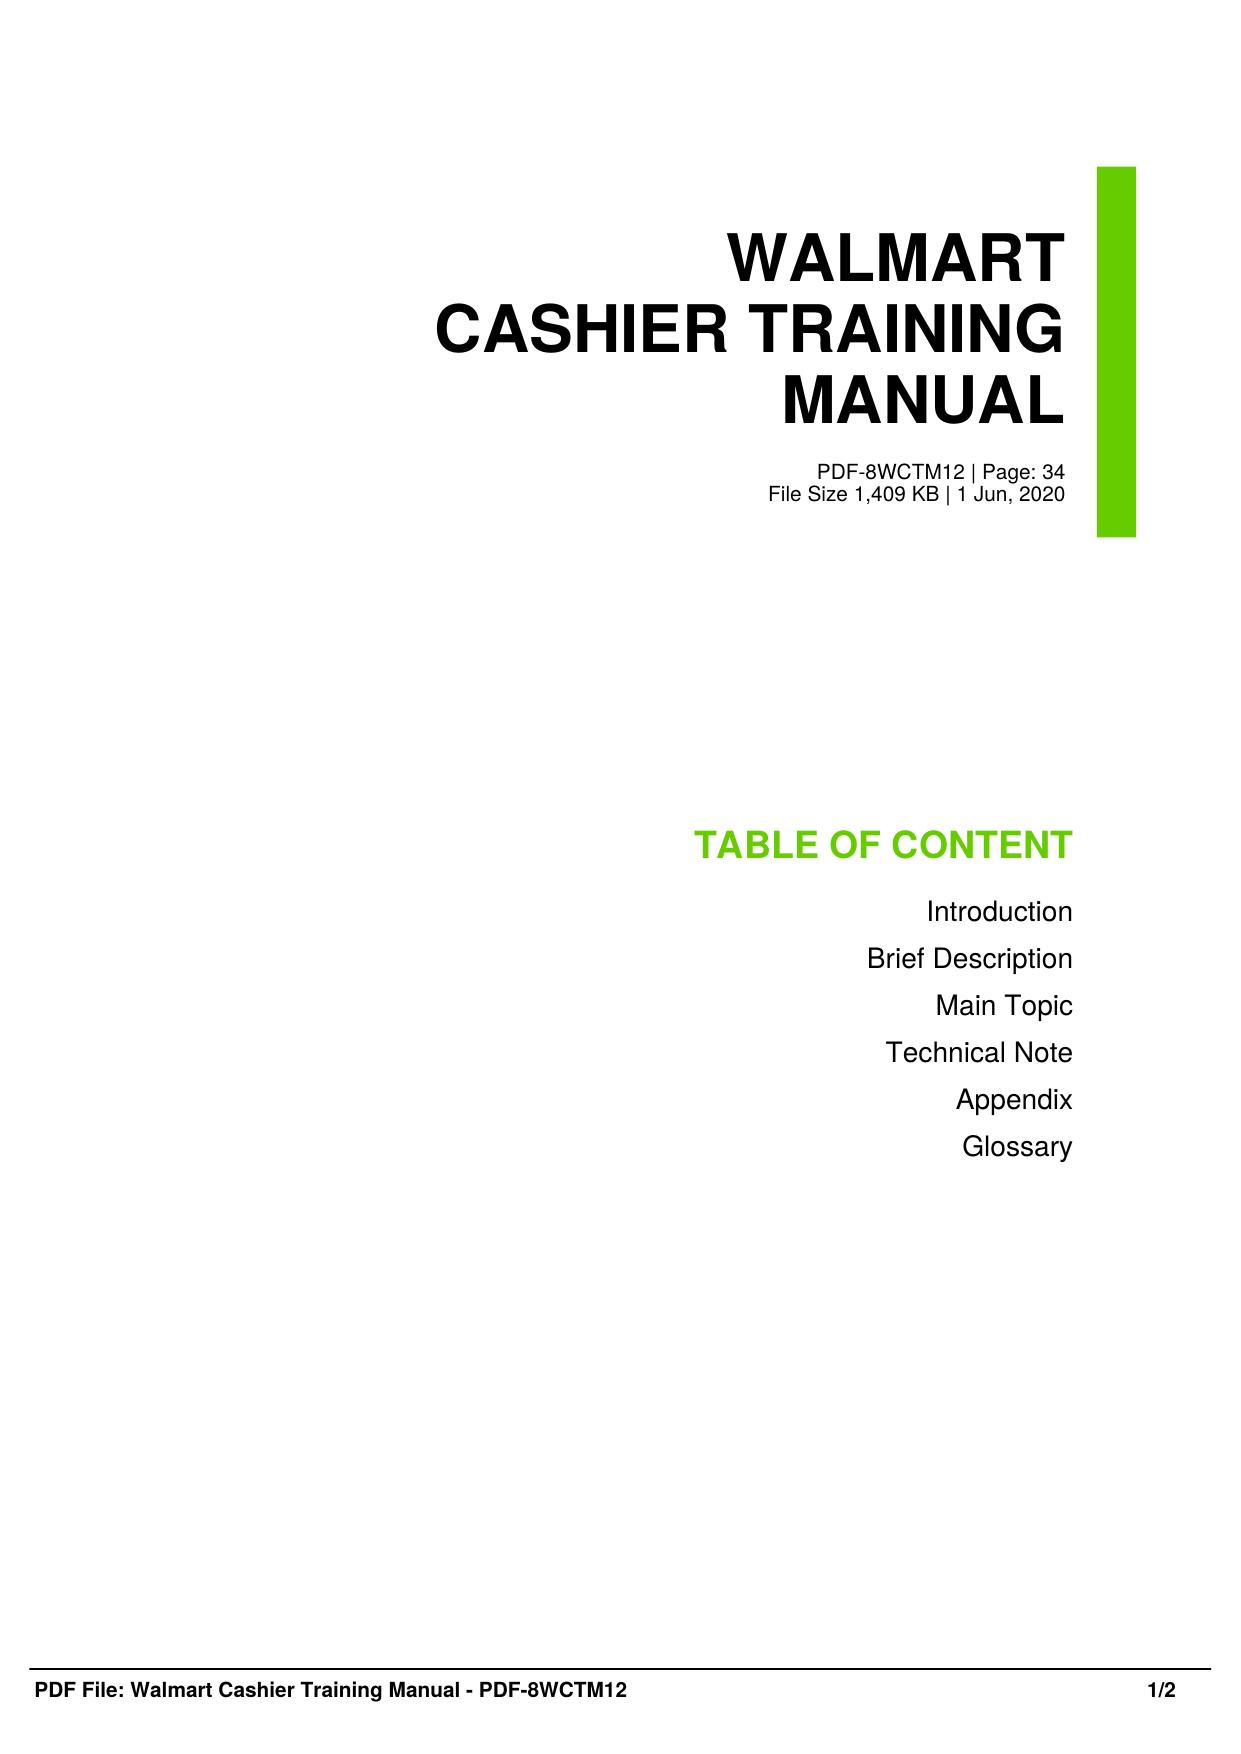 Walmart Cashier Training Manual